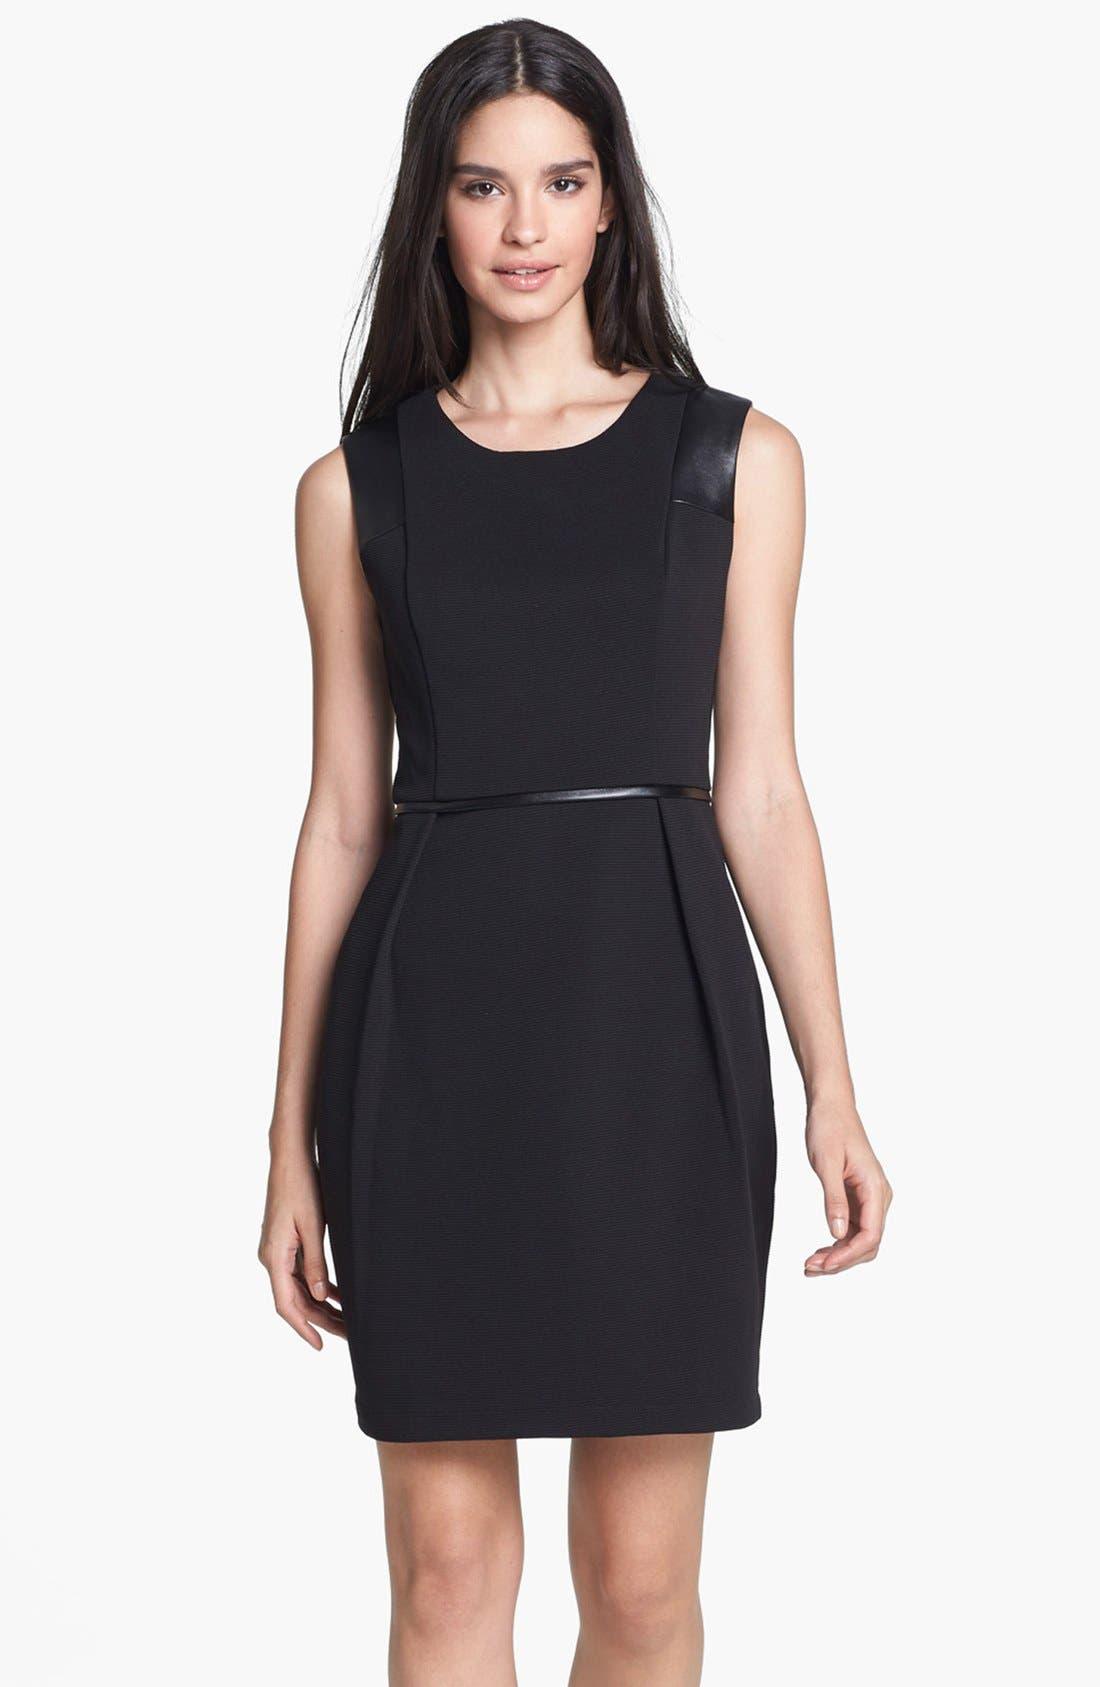 Alternate Image 1 Selected - Donna Ricco Faux Leather Trim Sheath Dress